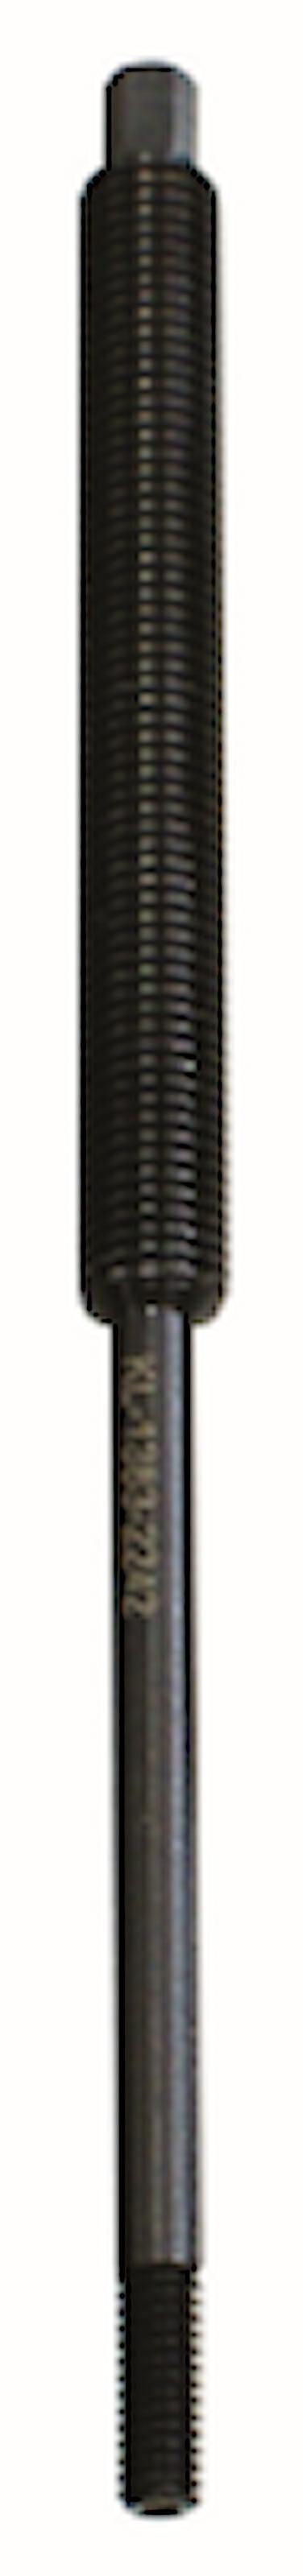 Dragbult nr 12-24 UNC, 165 mm